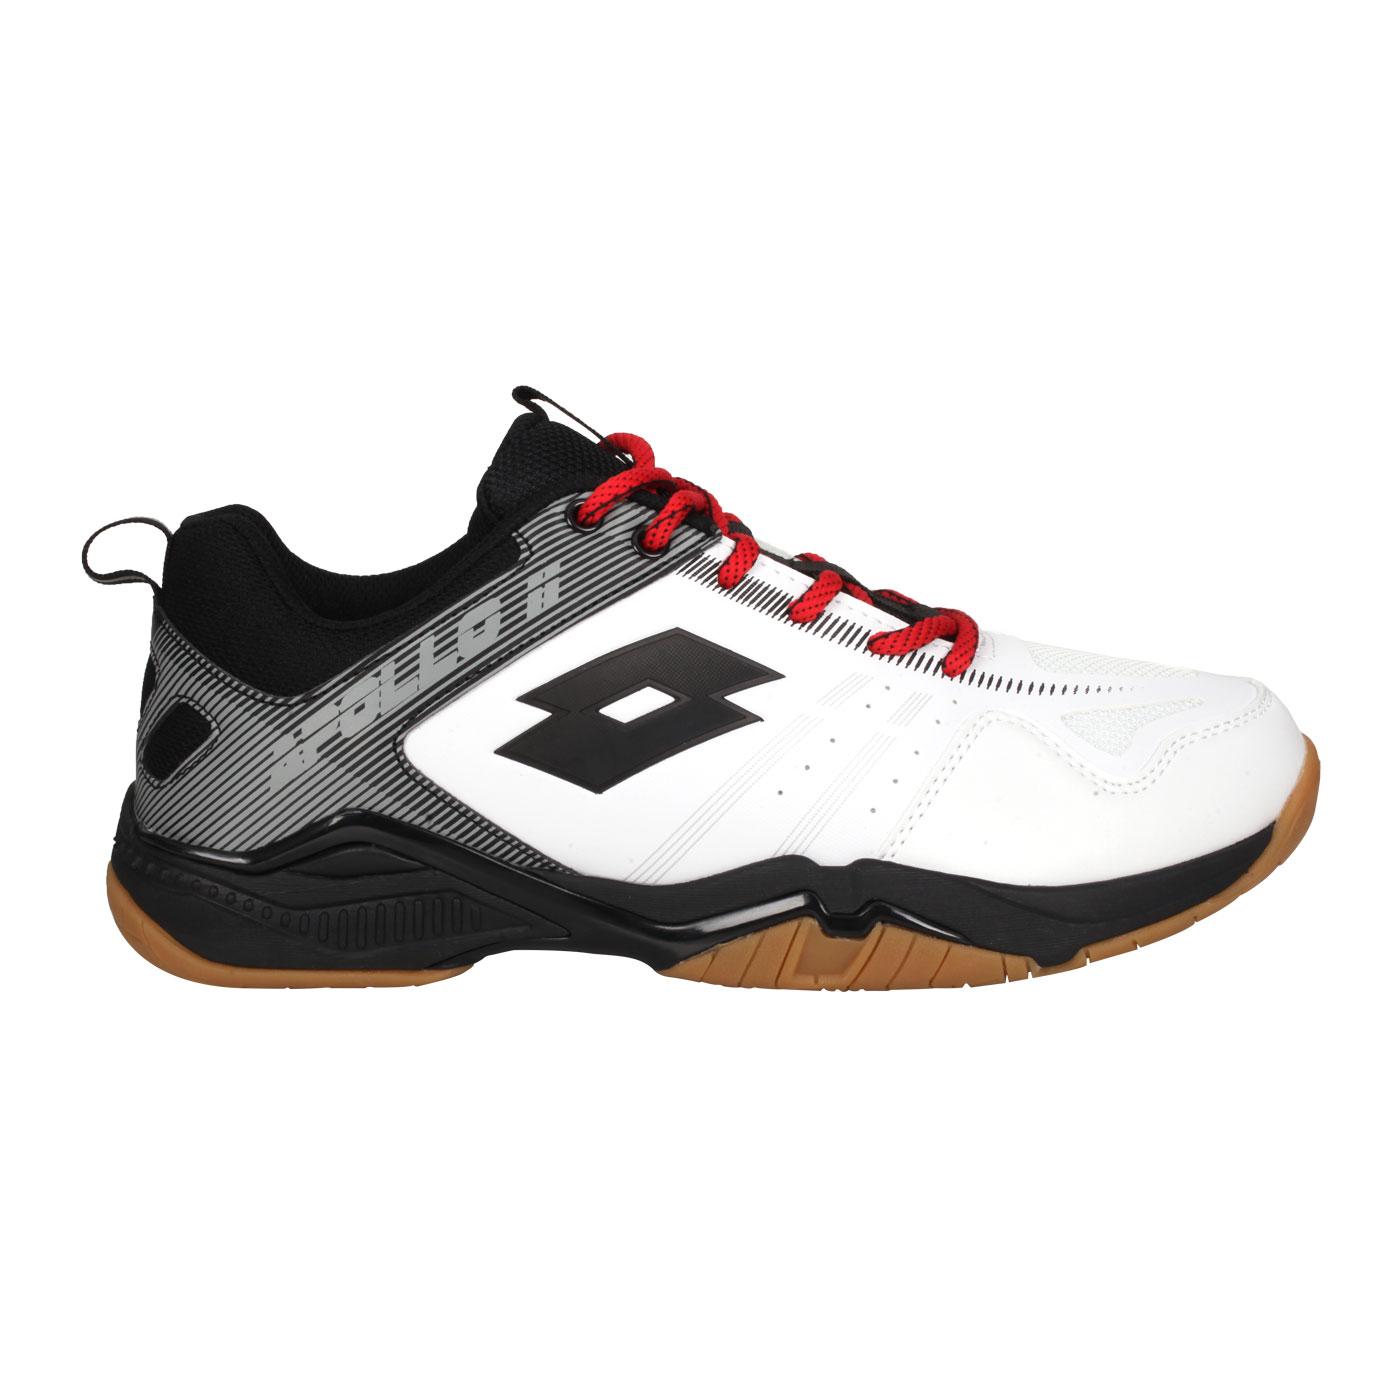 LOTTO 男款專業羽球鞋 LT0AMI2588 - 白黑灰紅